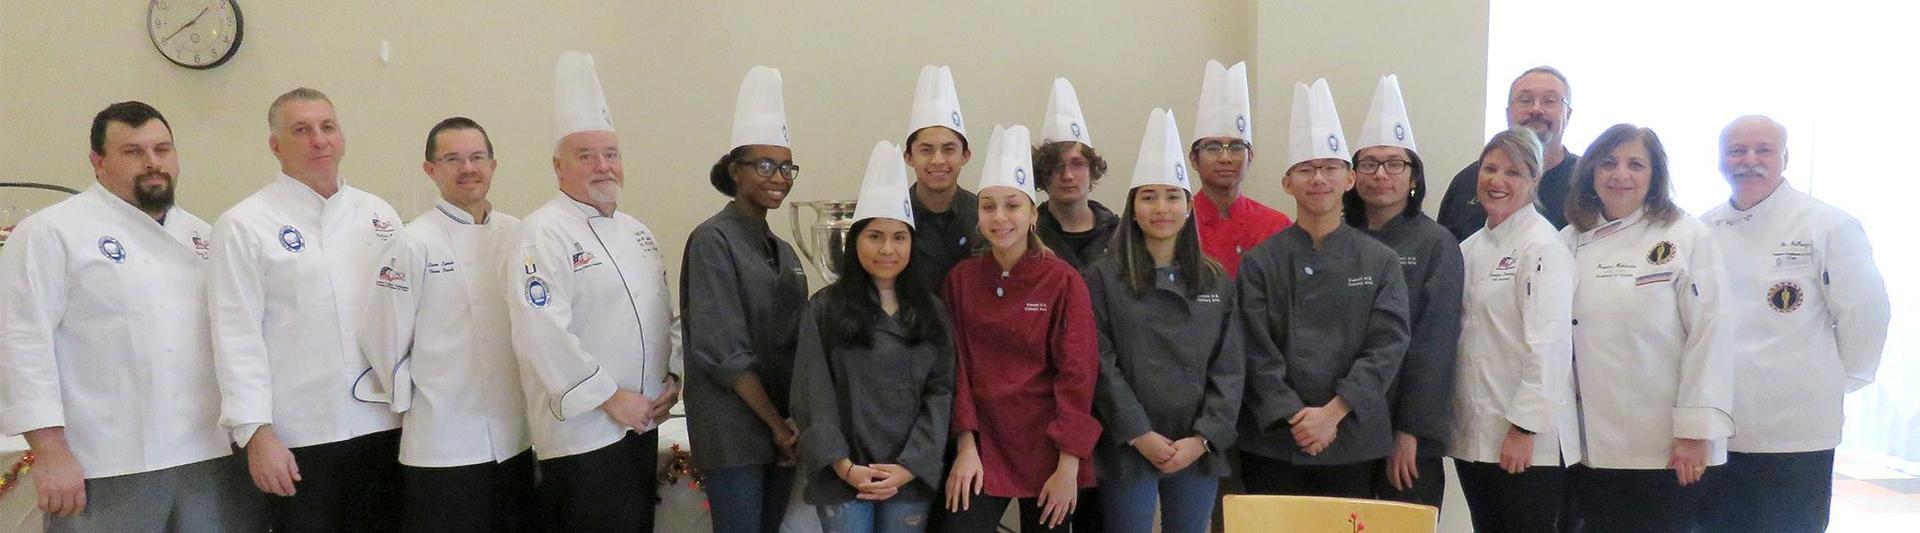 EHS Culinary Arts students